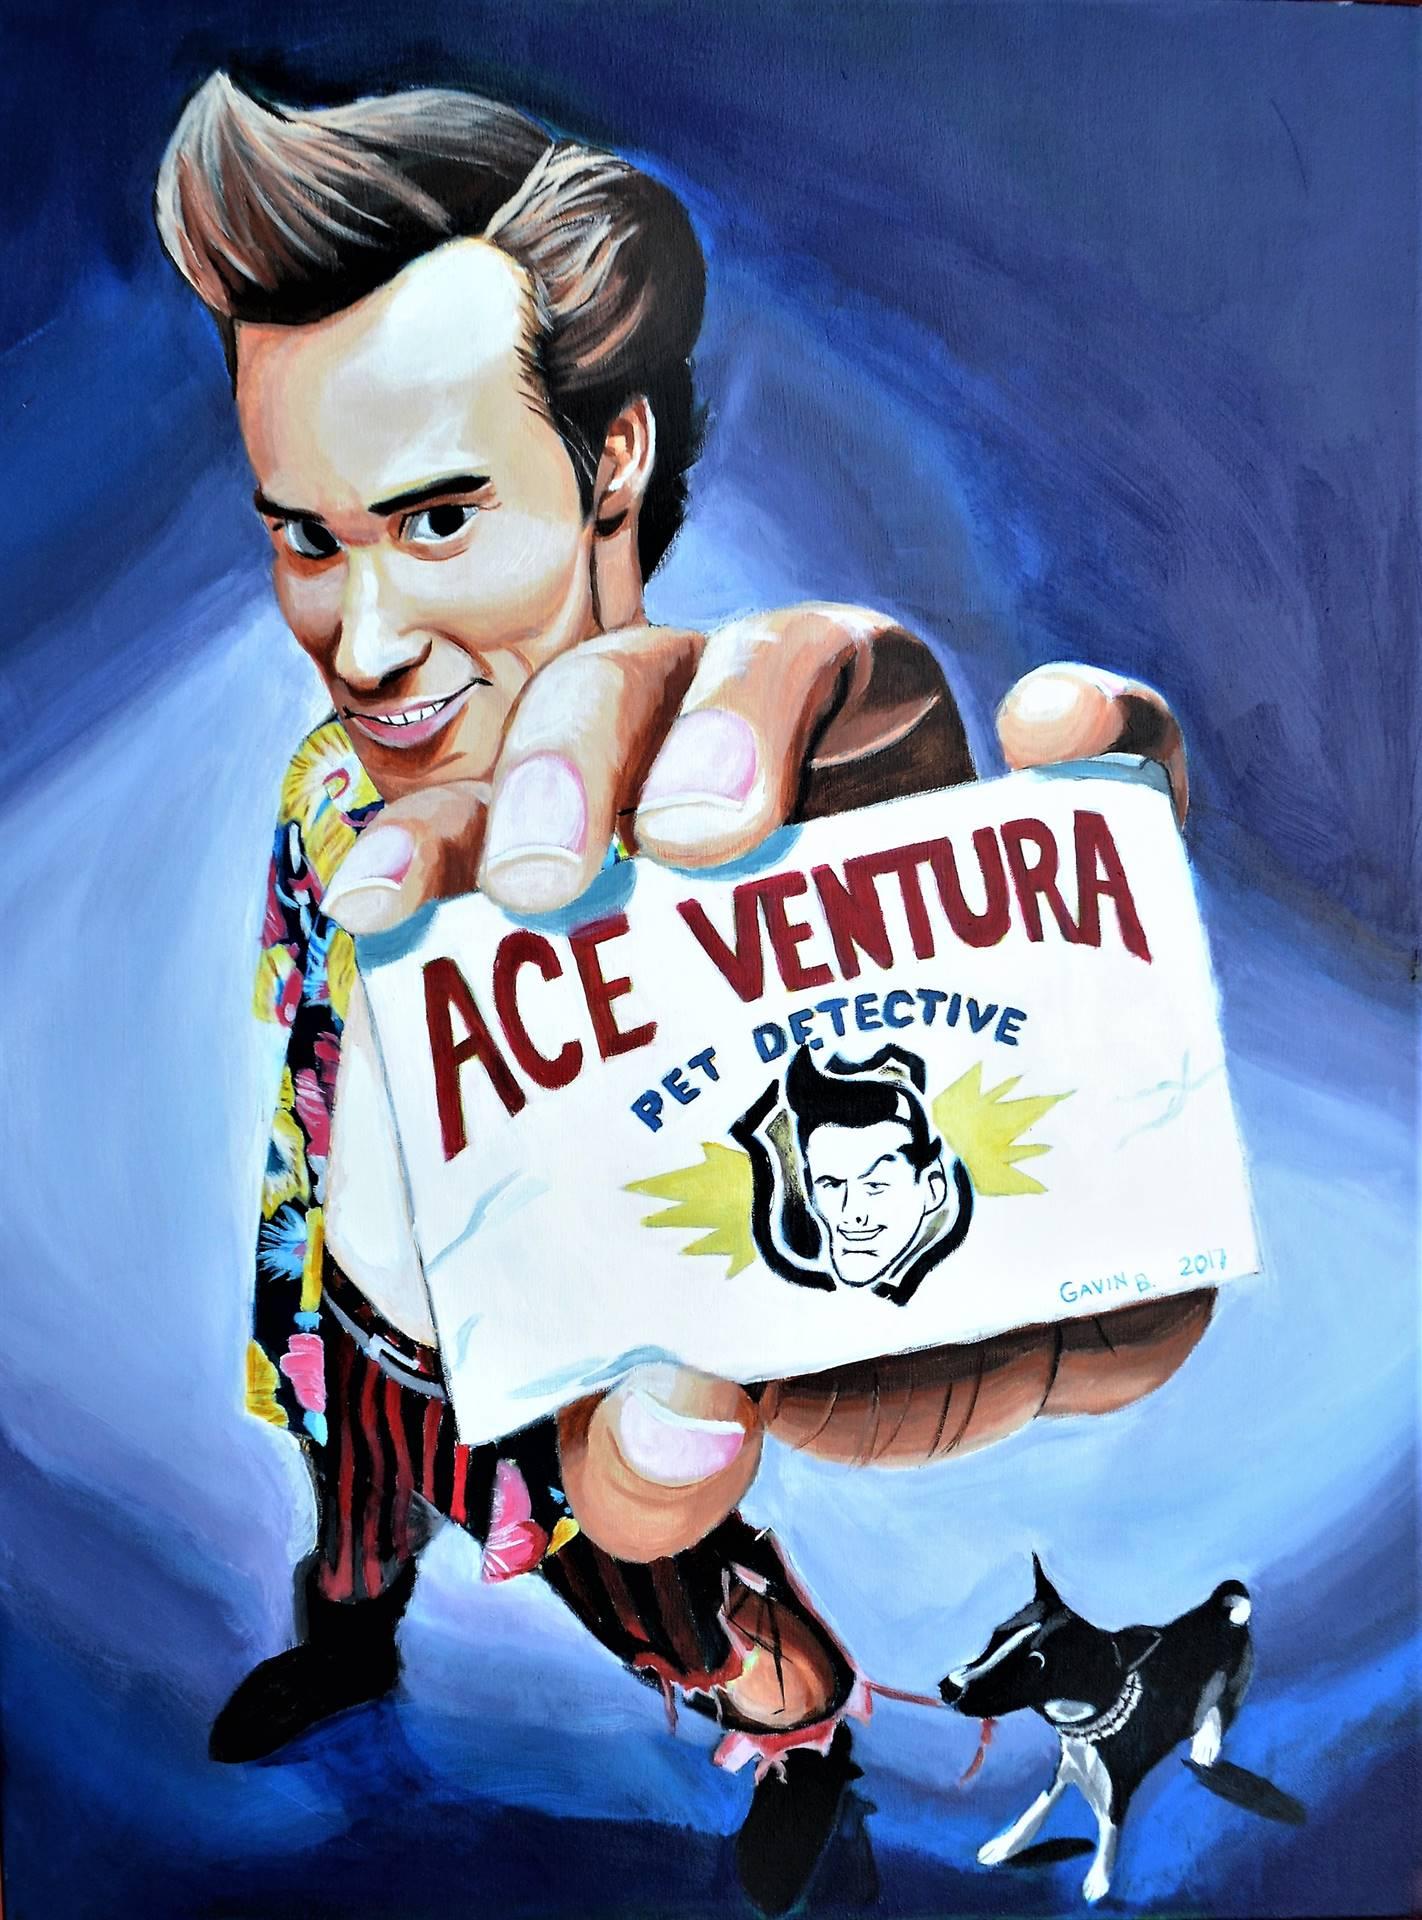 Gavin Bocanegra, Ace Ventura, acrylic on canvas, 40 x 30, 2017